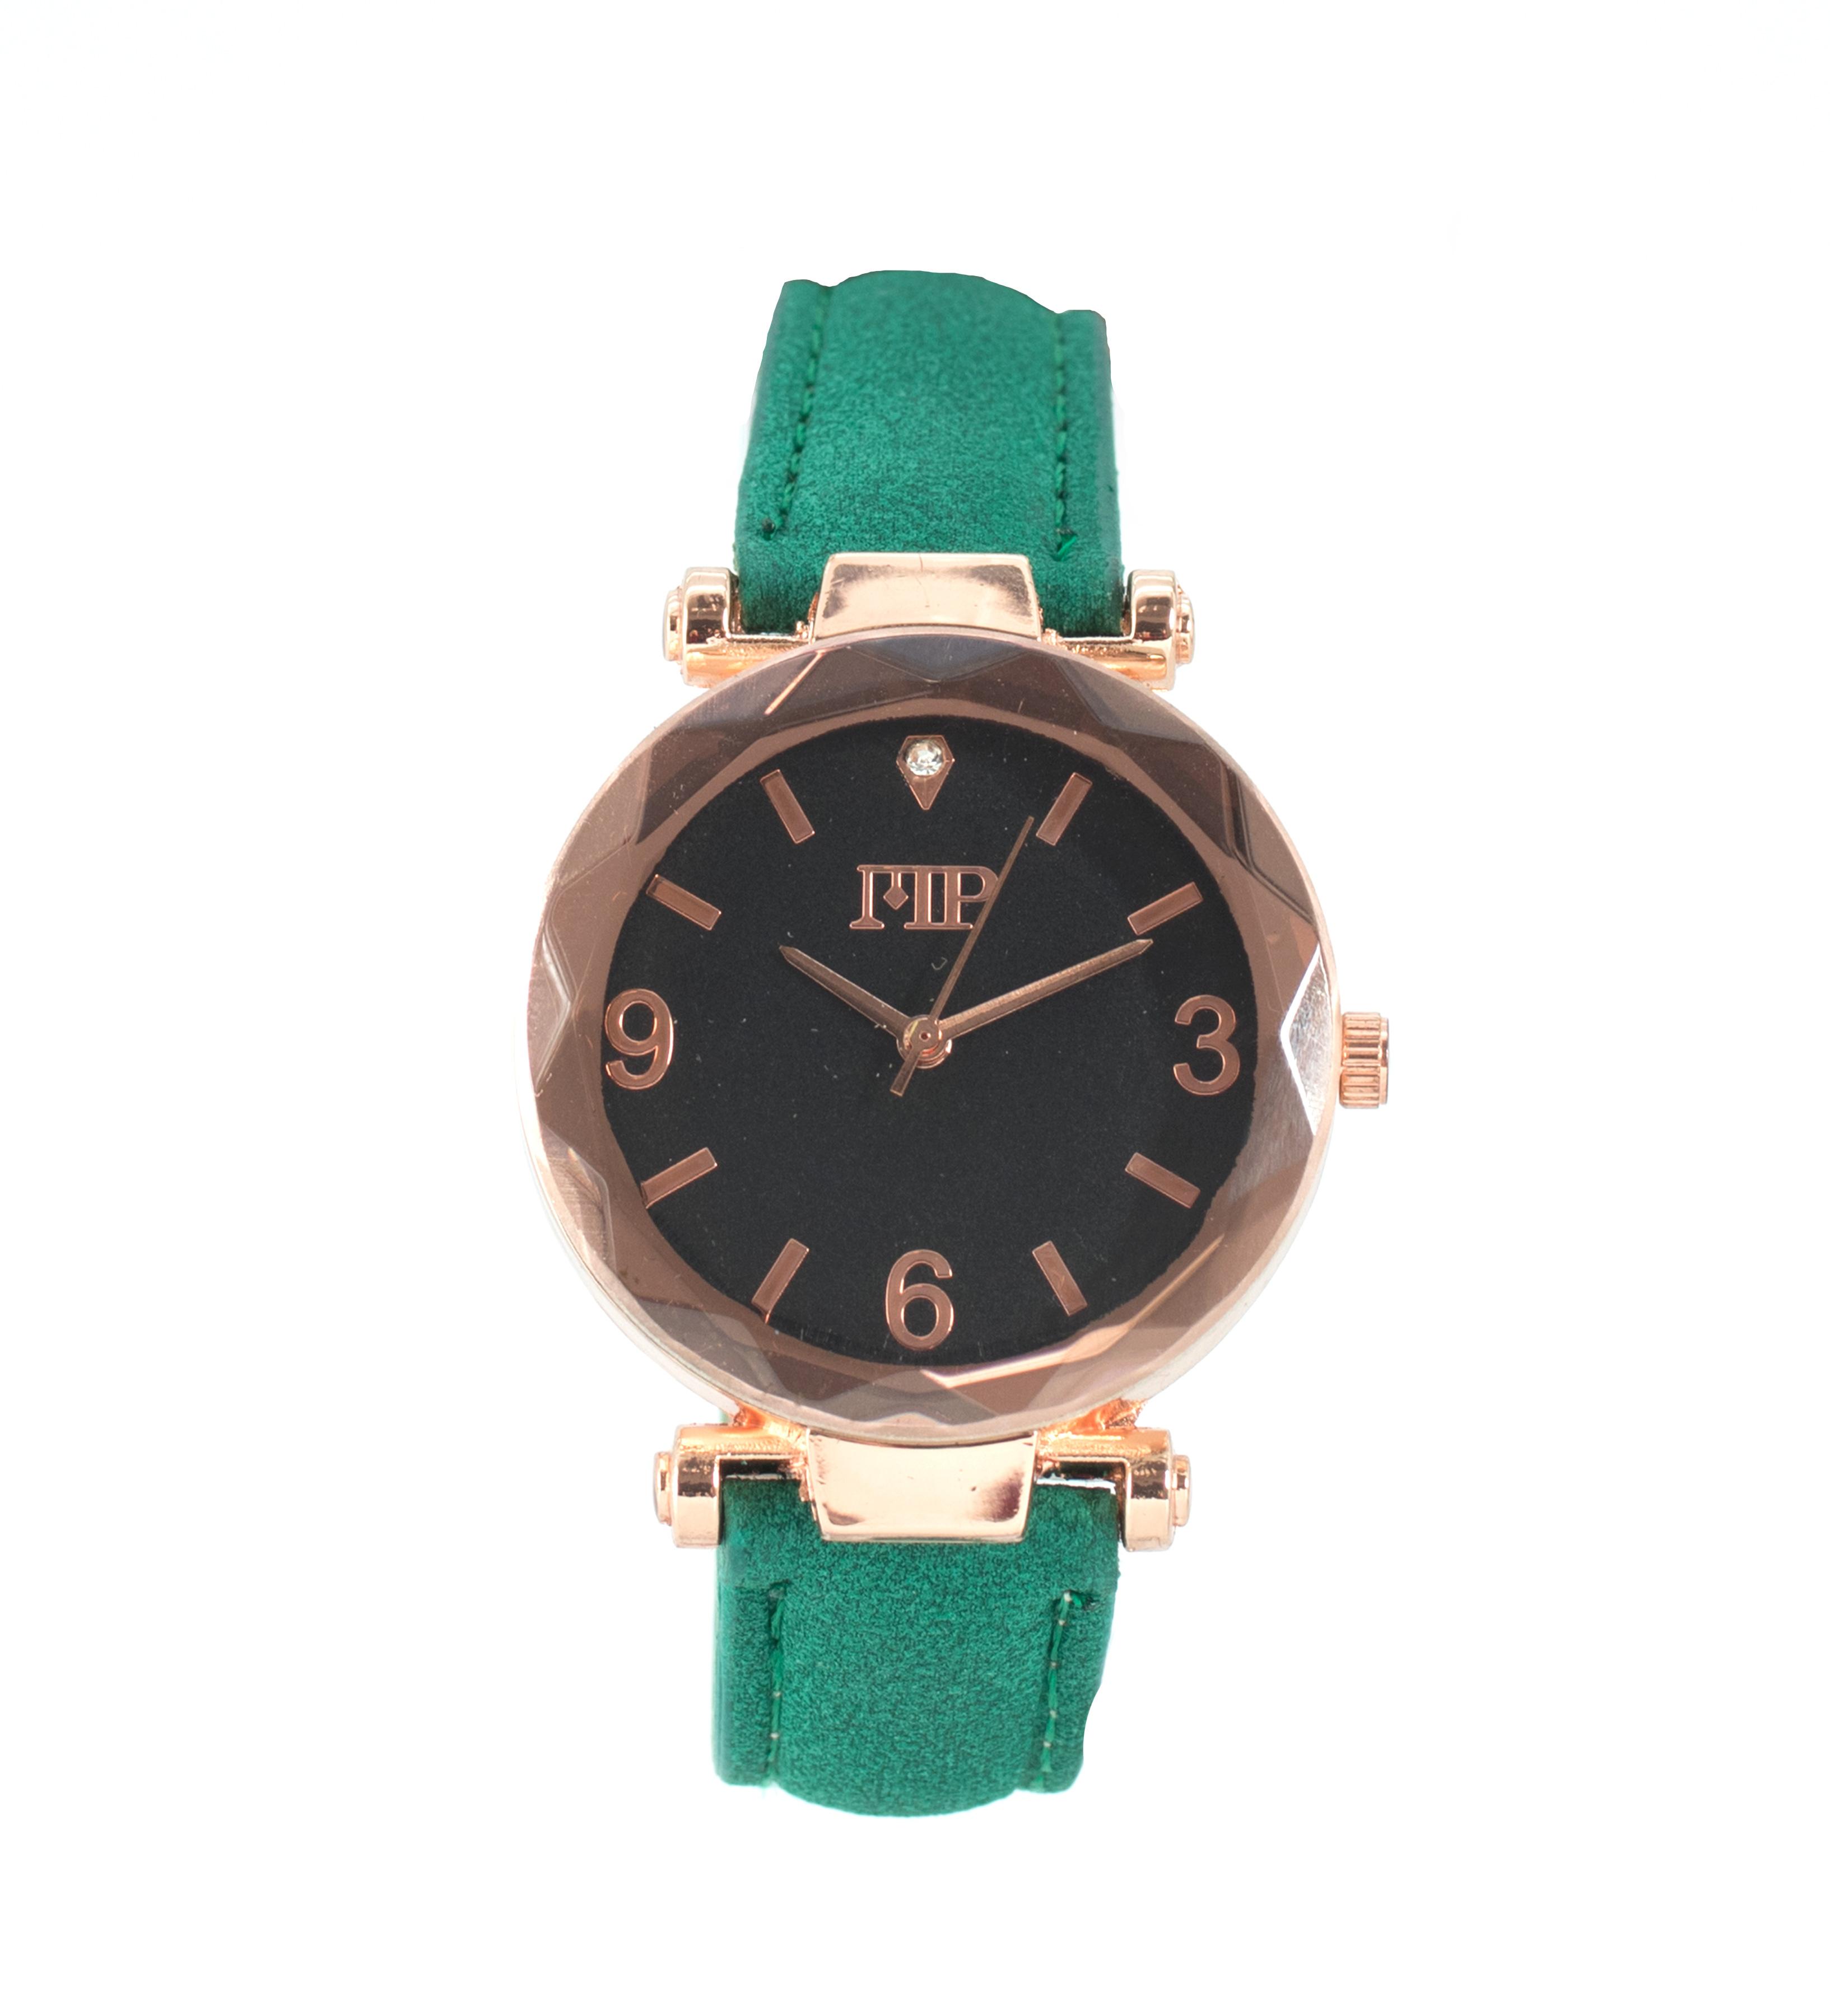 Comprar Marsan Piel Goldstein Vert Analogique Horloge